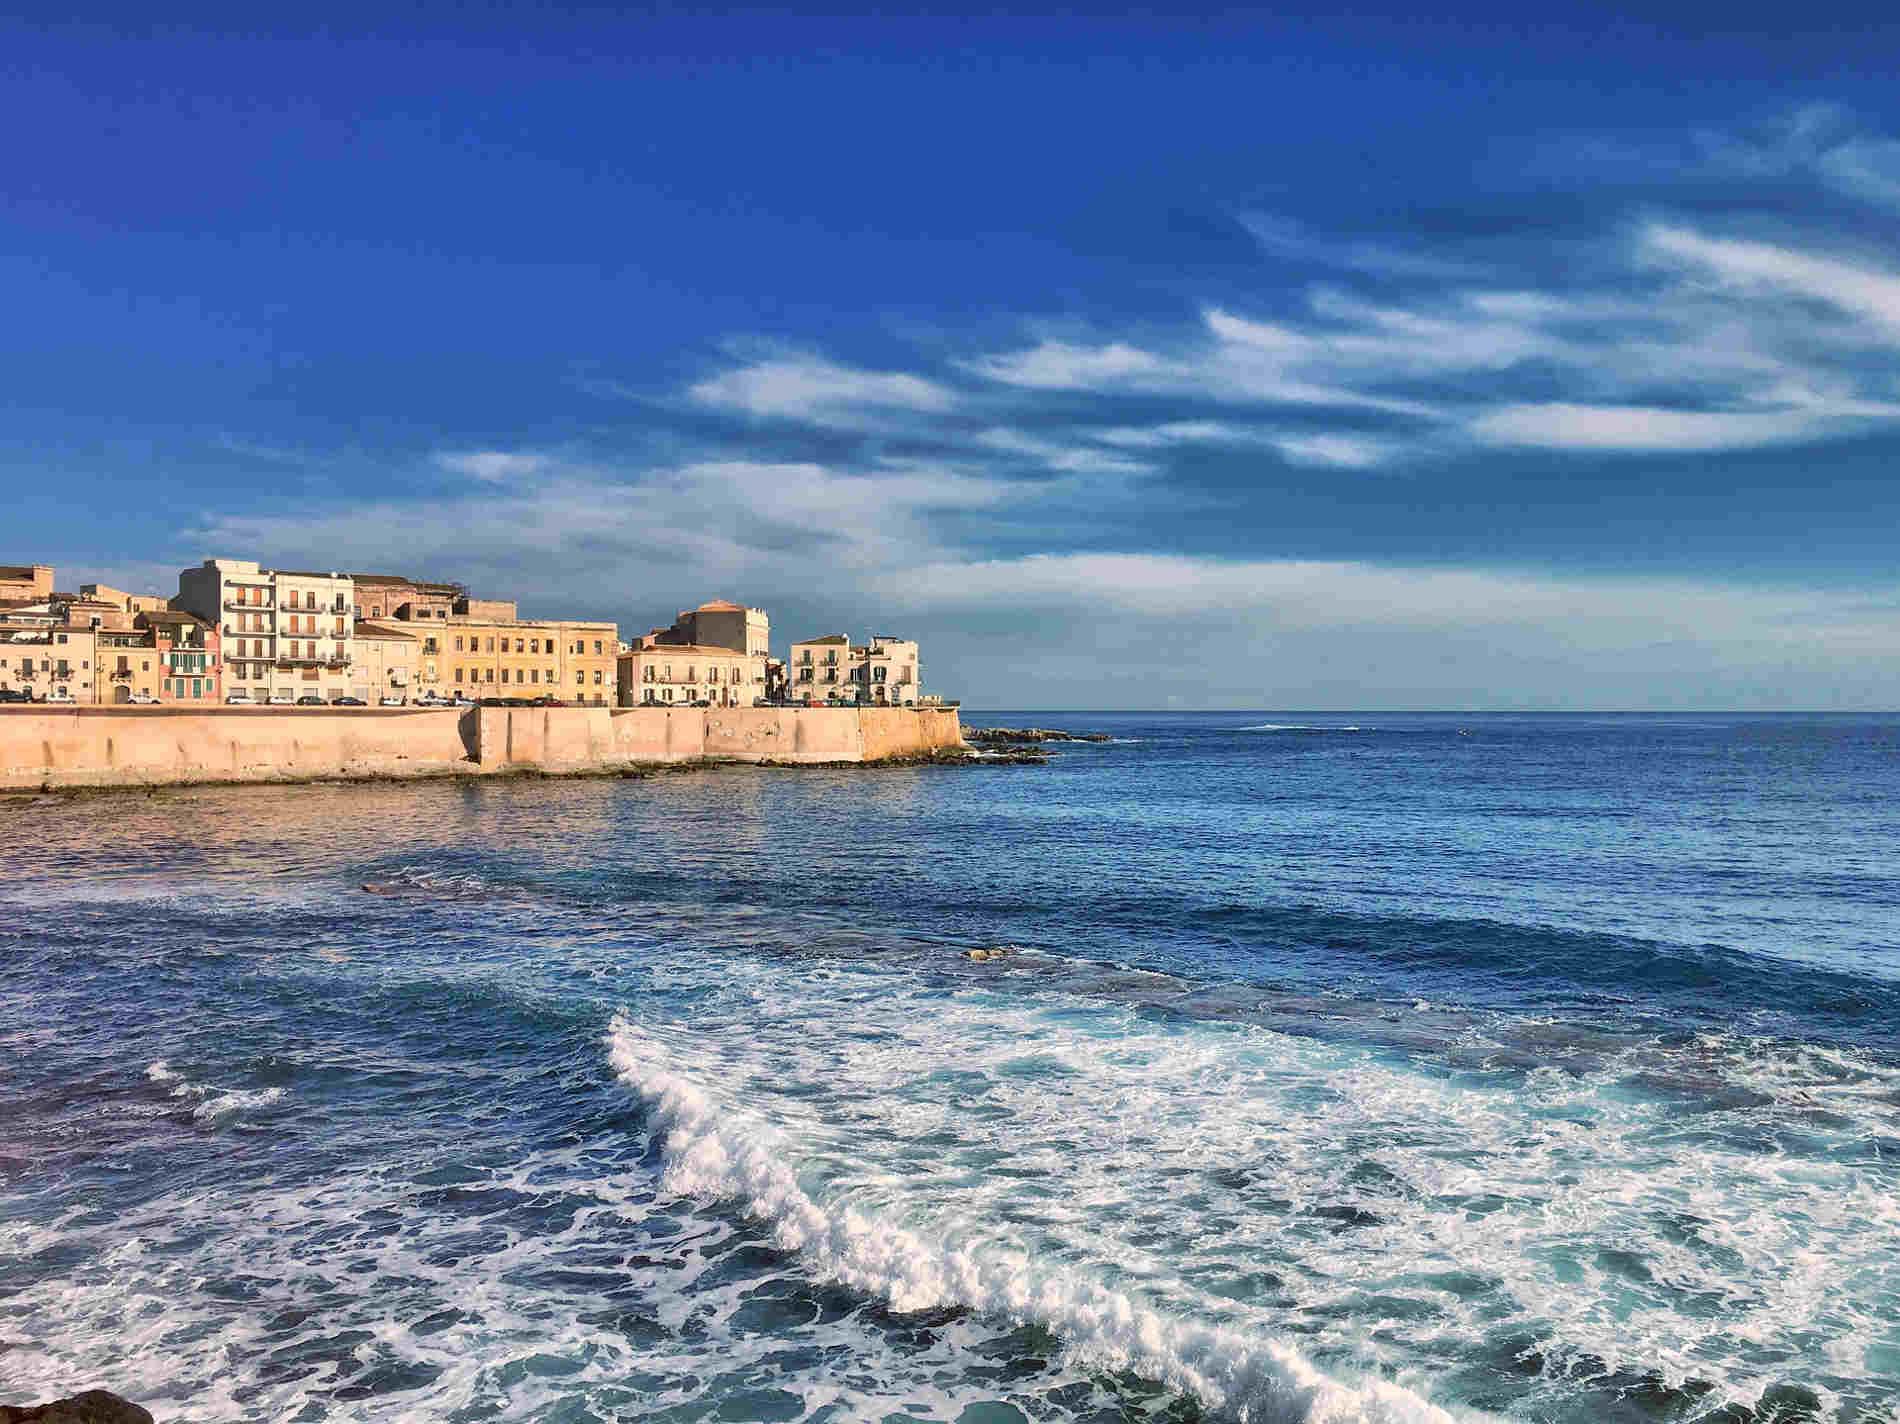 Codsa vedere a Siracusa e dintorni l'Isola di Ortigia